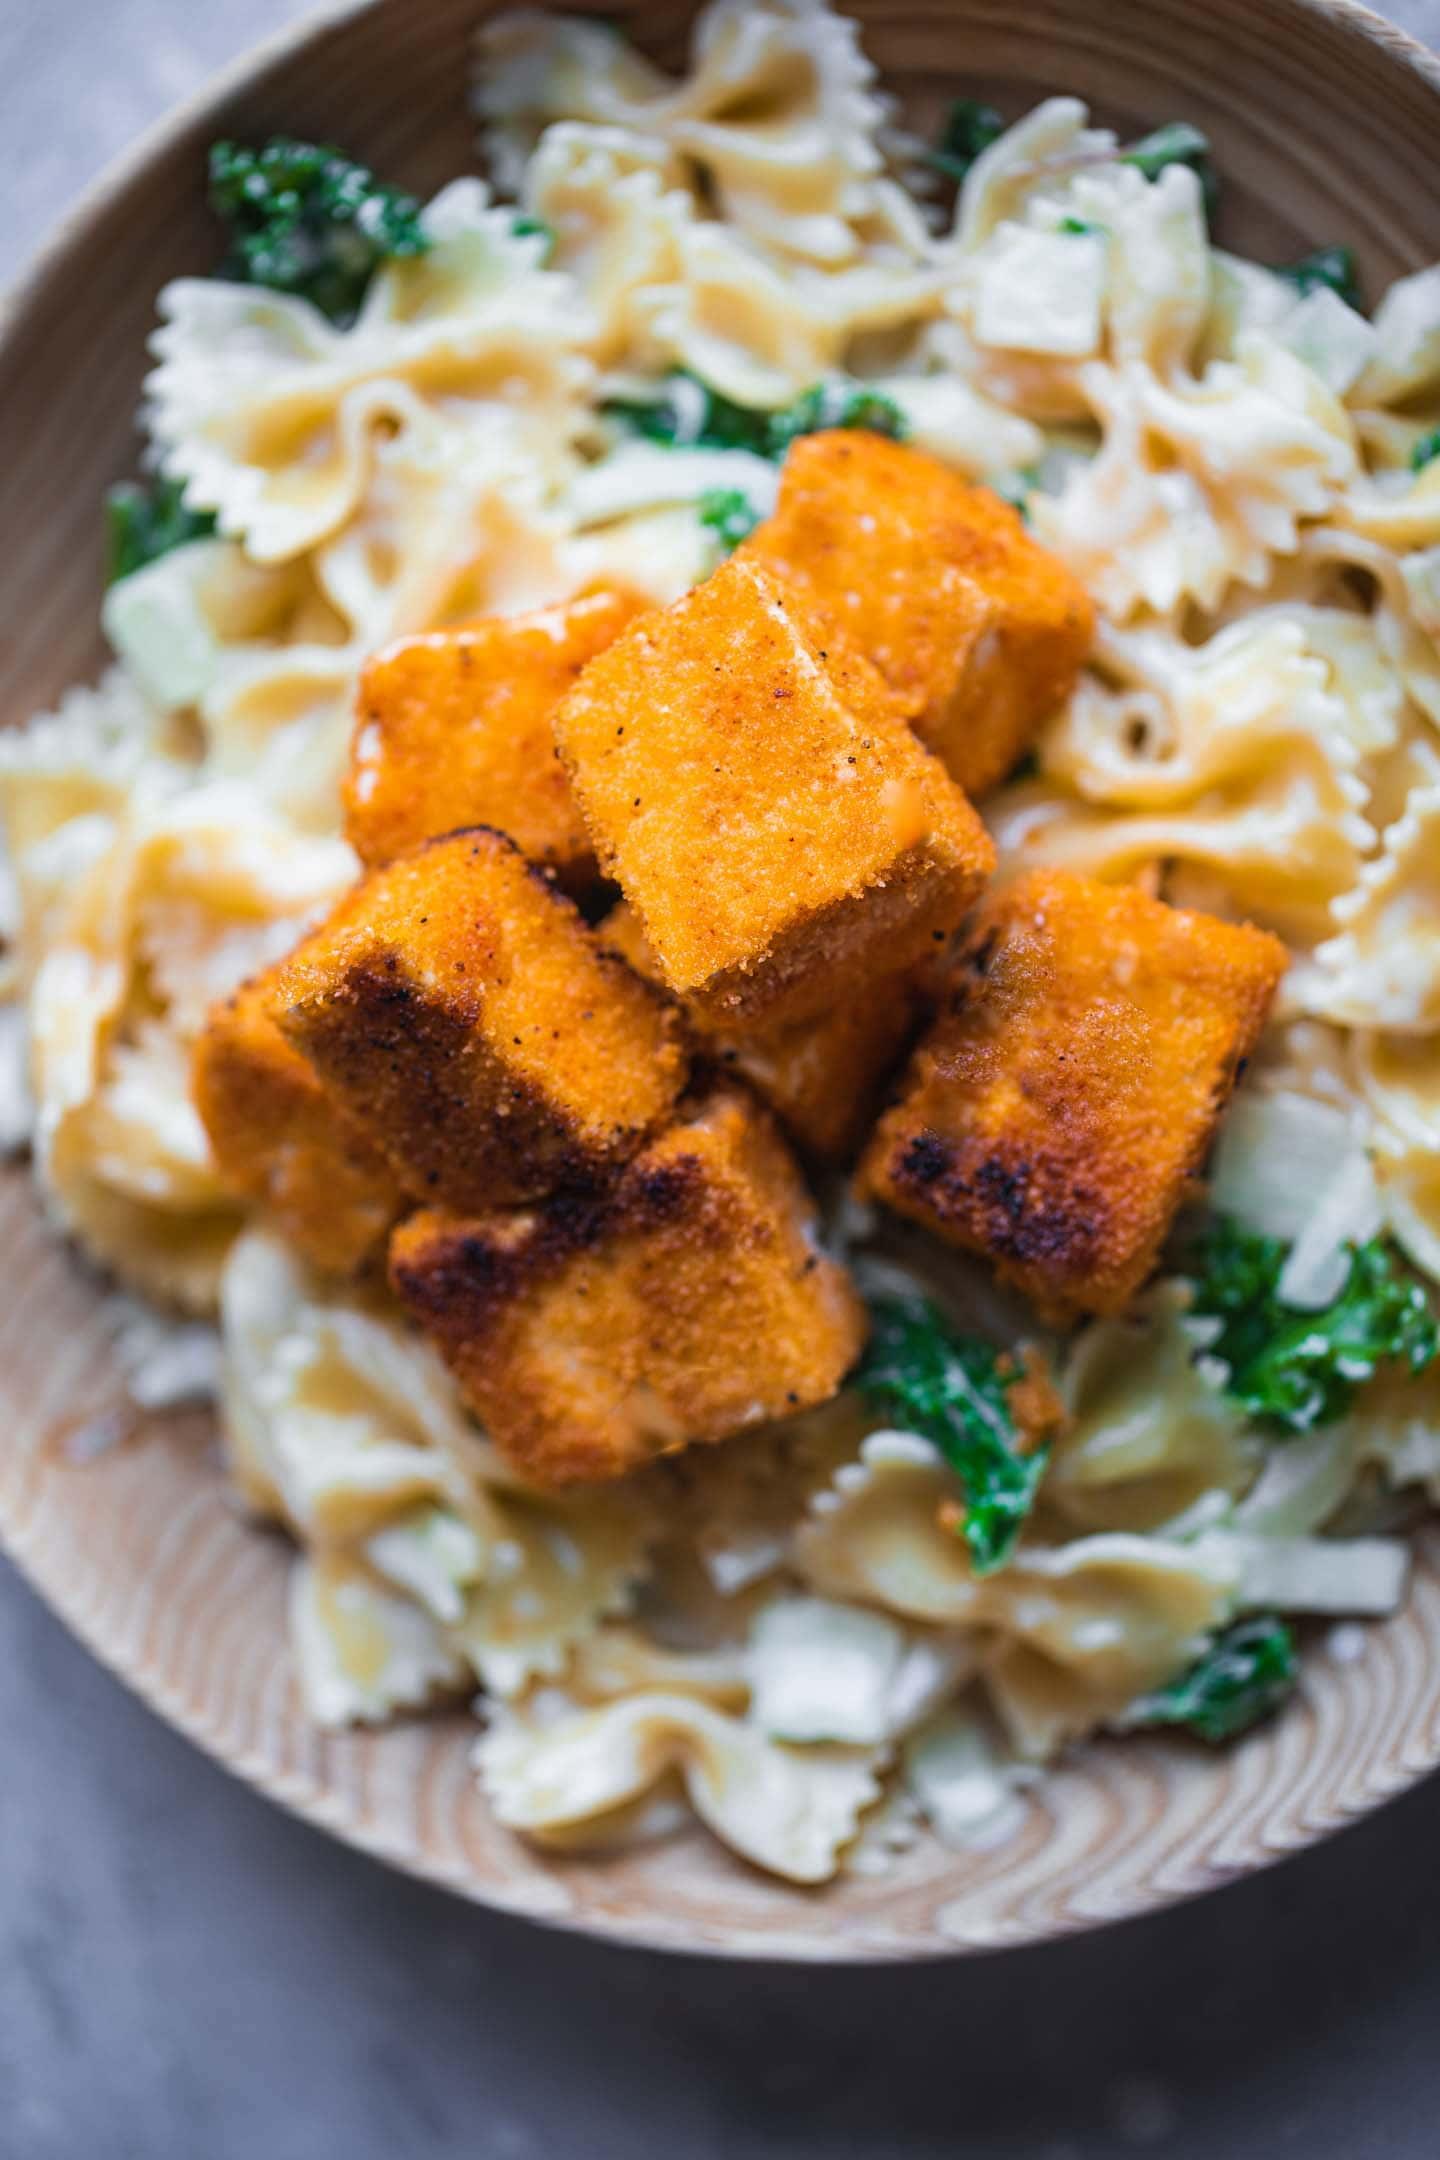 Fried tofu and creamy kale pasta